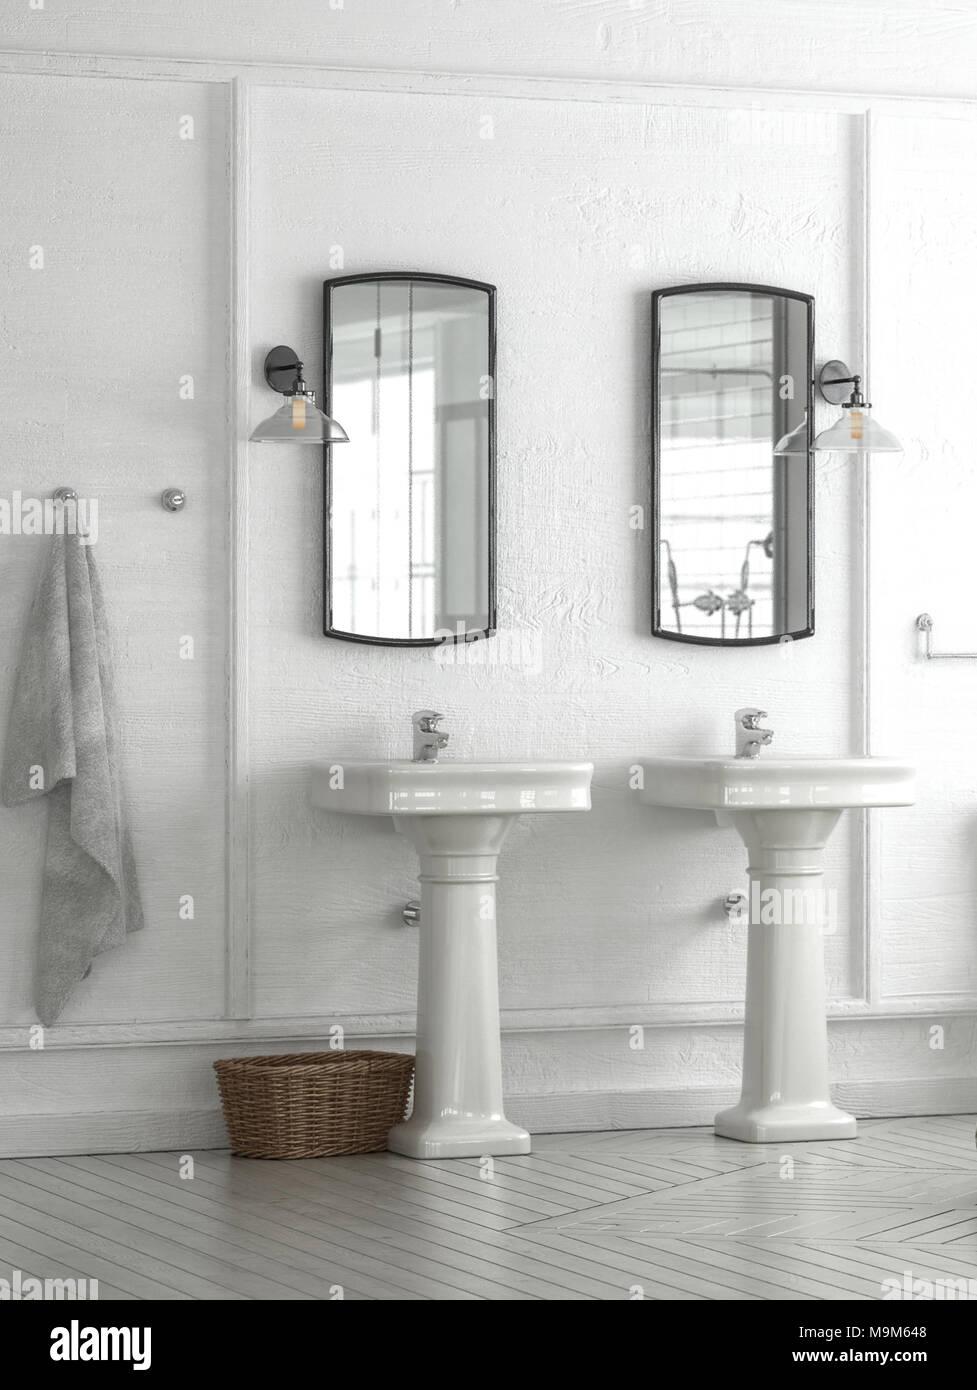 Lavabi moderni finest lavabi moderni with lavabi moderni for Lavabi bagno moderni